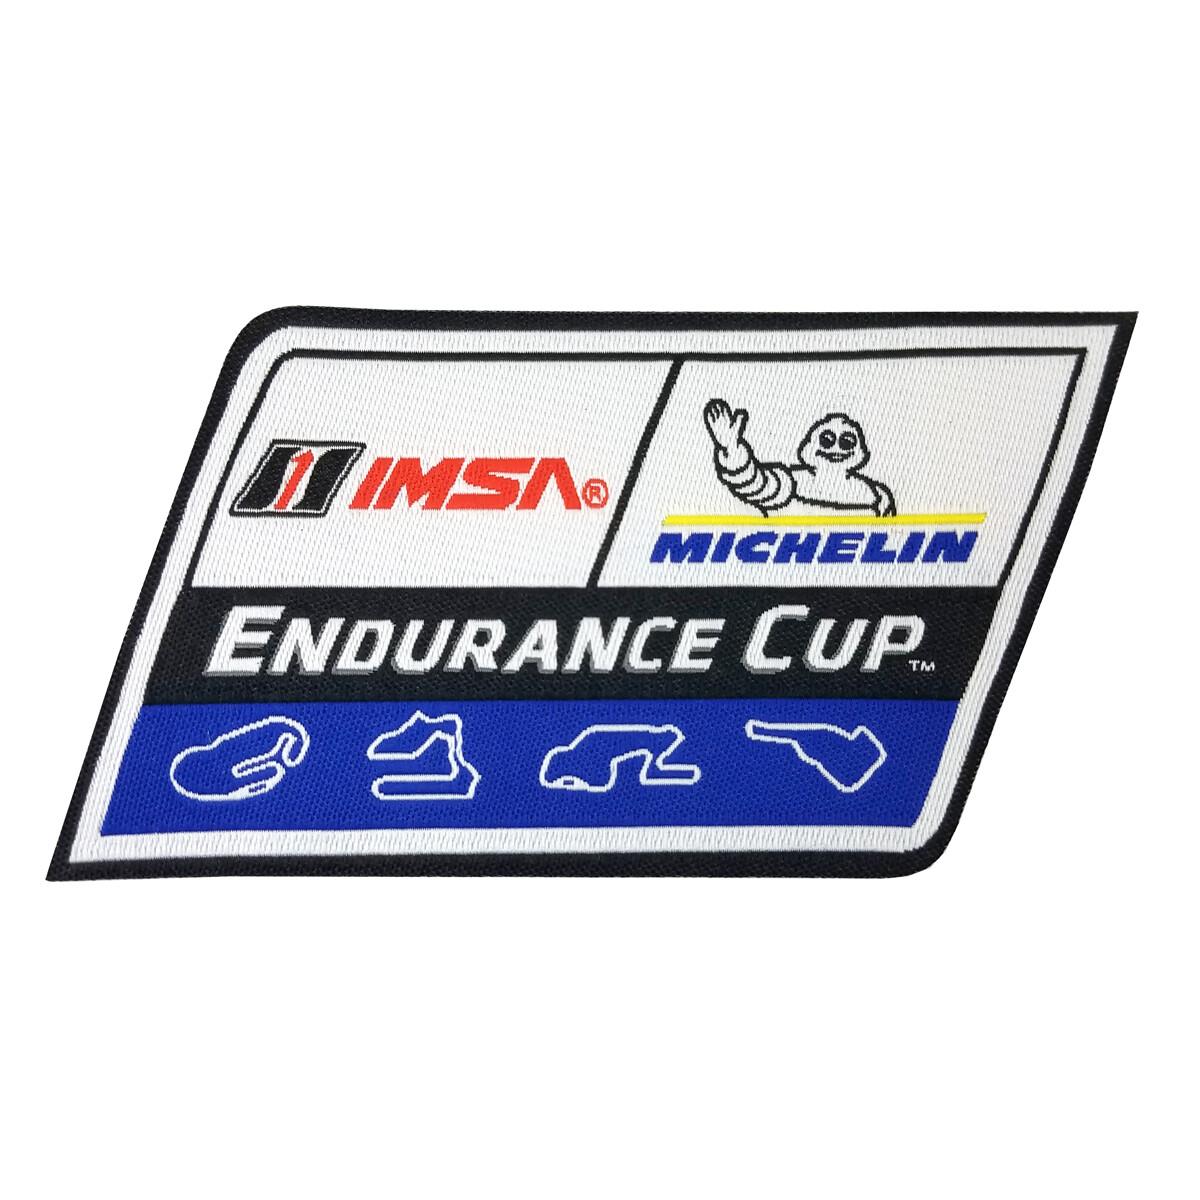 IMSA Endurance Cup Woven Patch